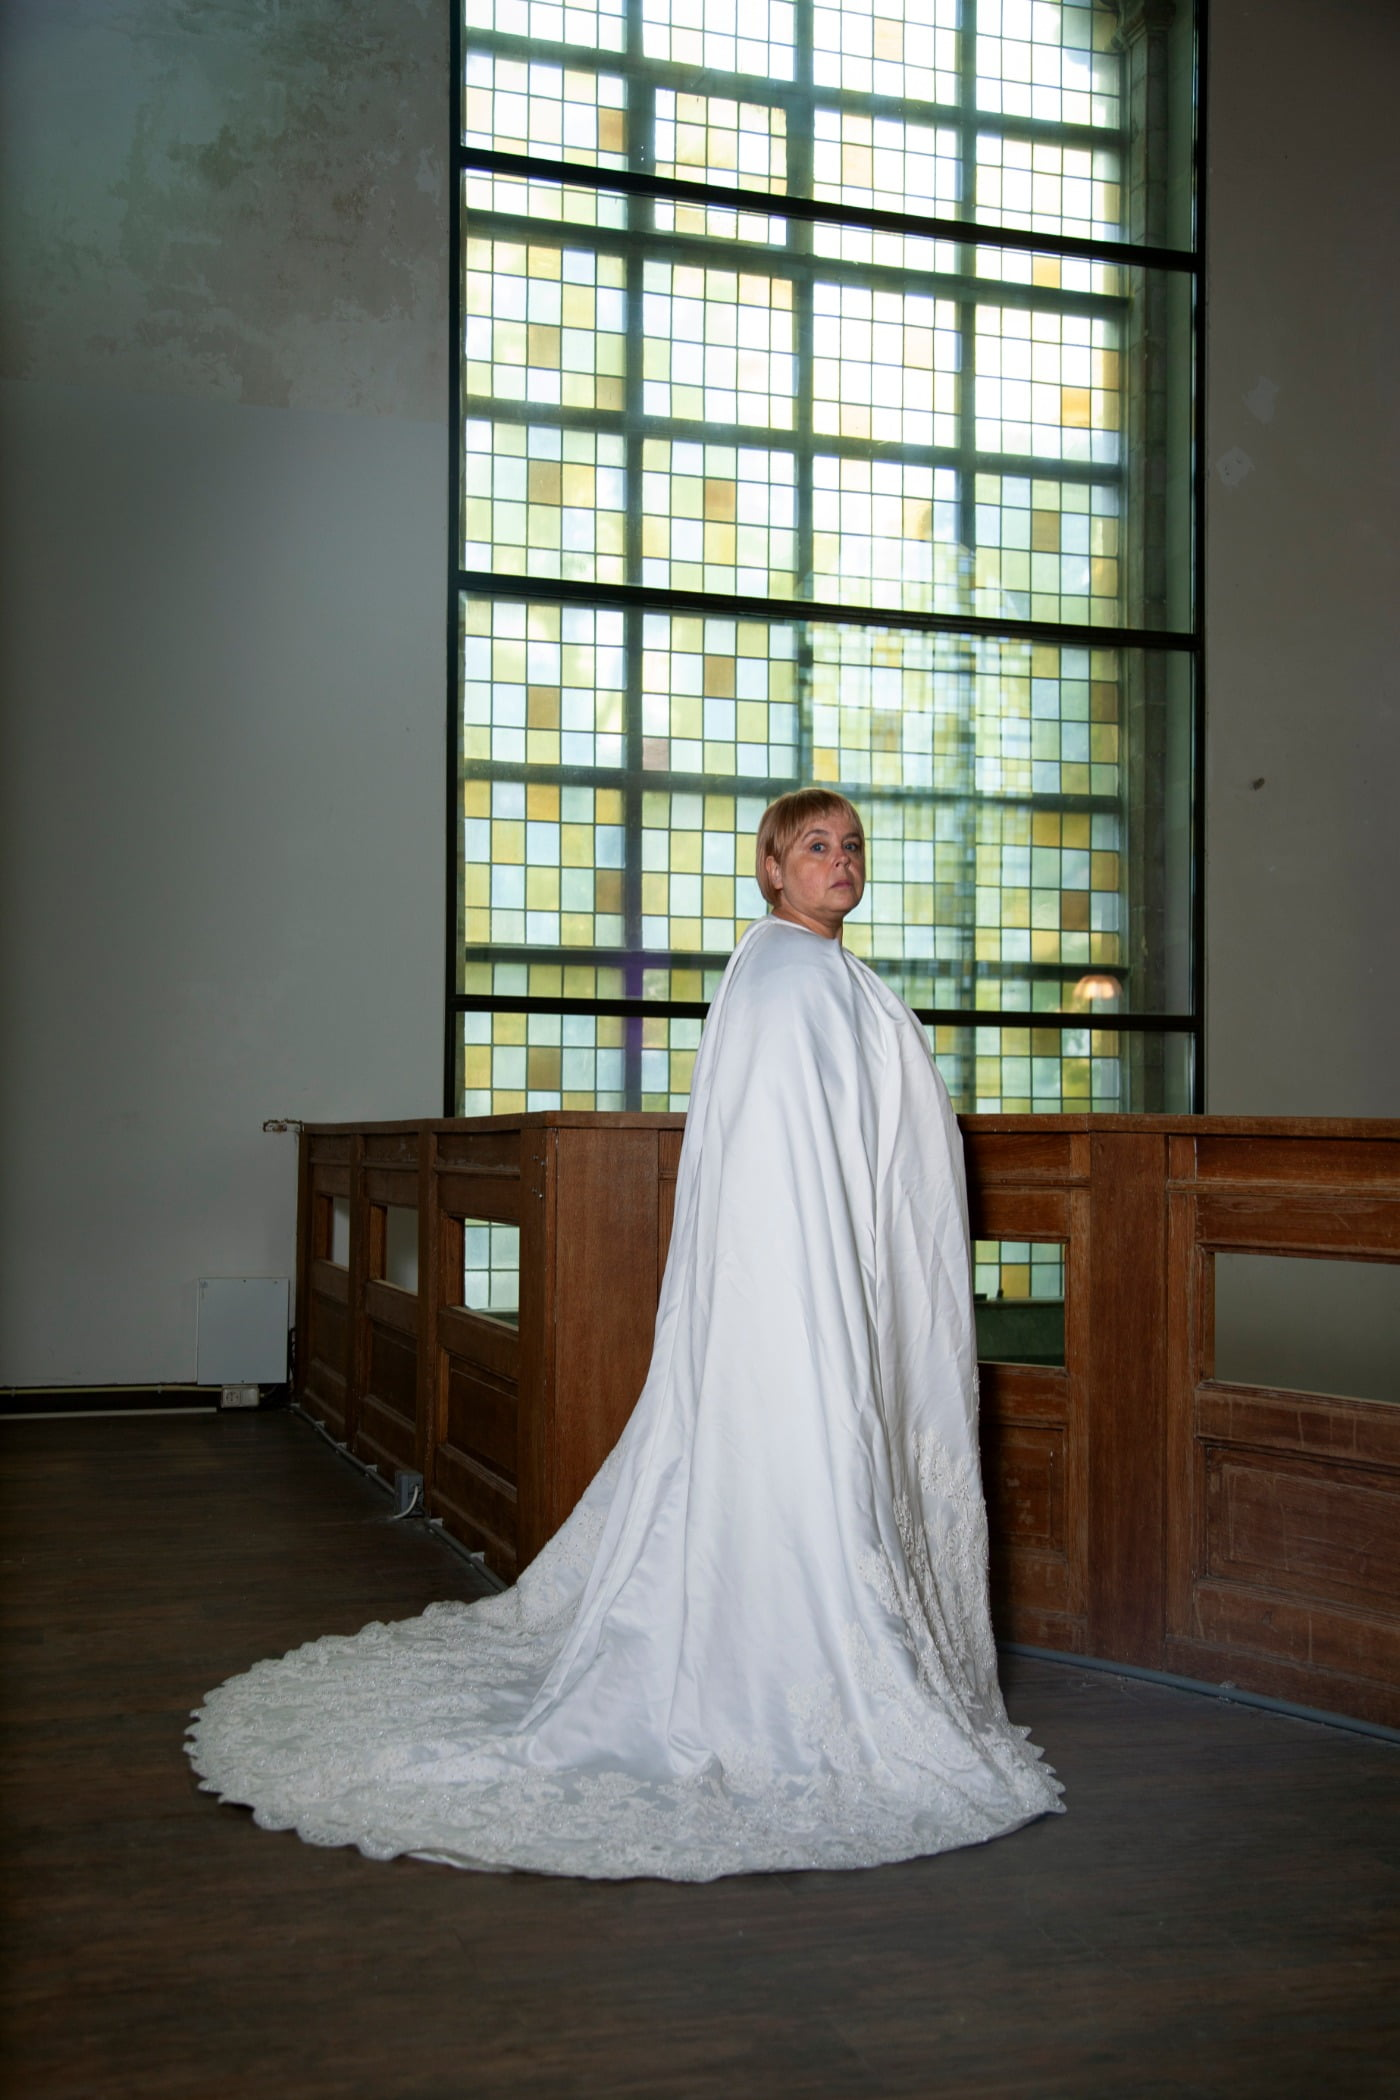 Wedding dress, Bridal clothing, Window, Wood, Plant